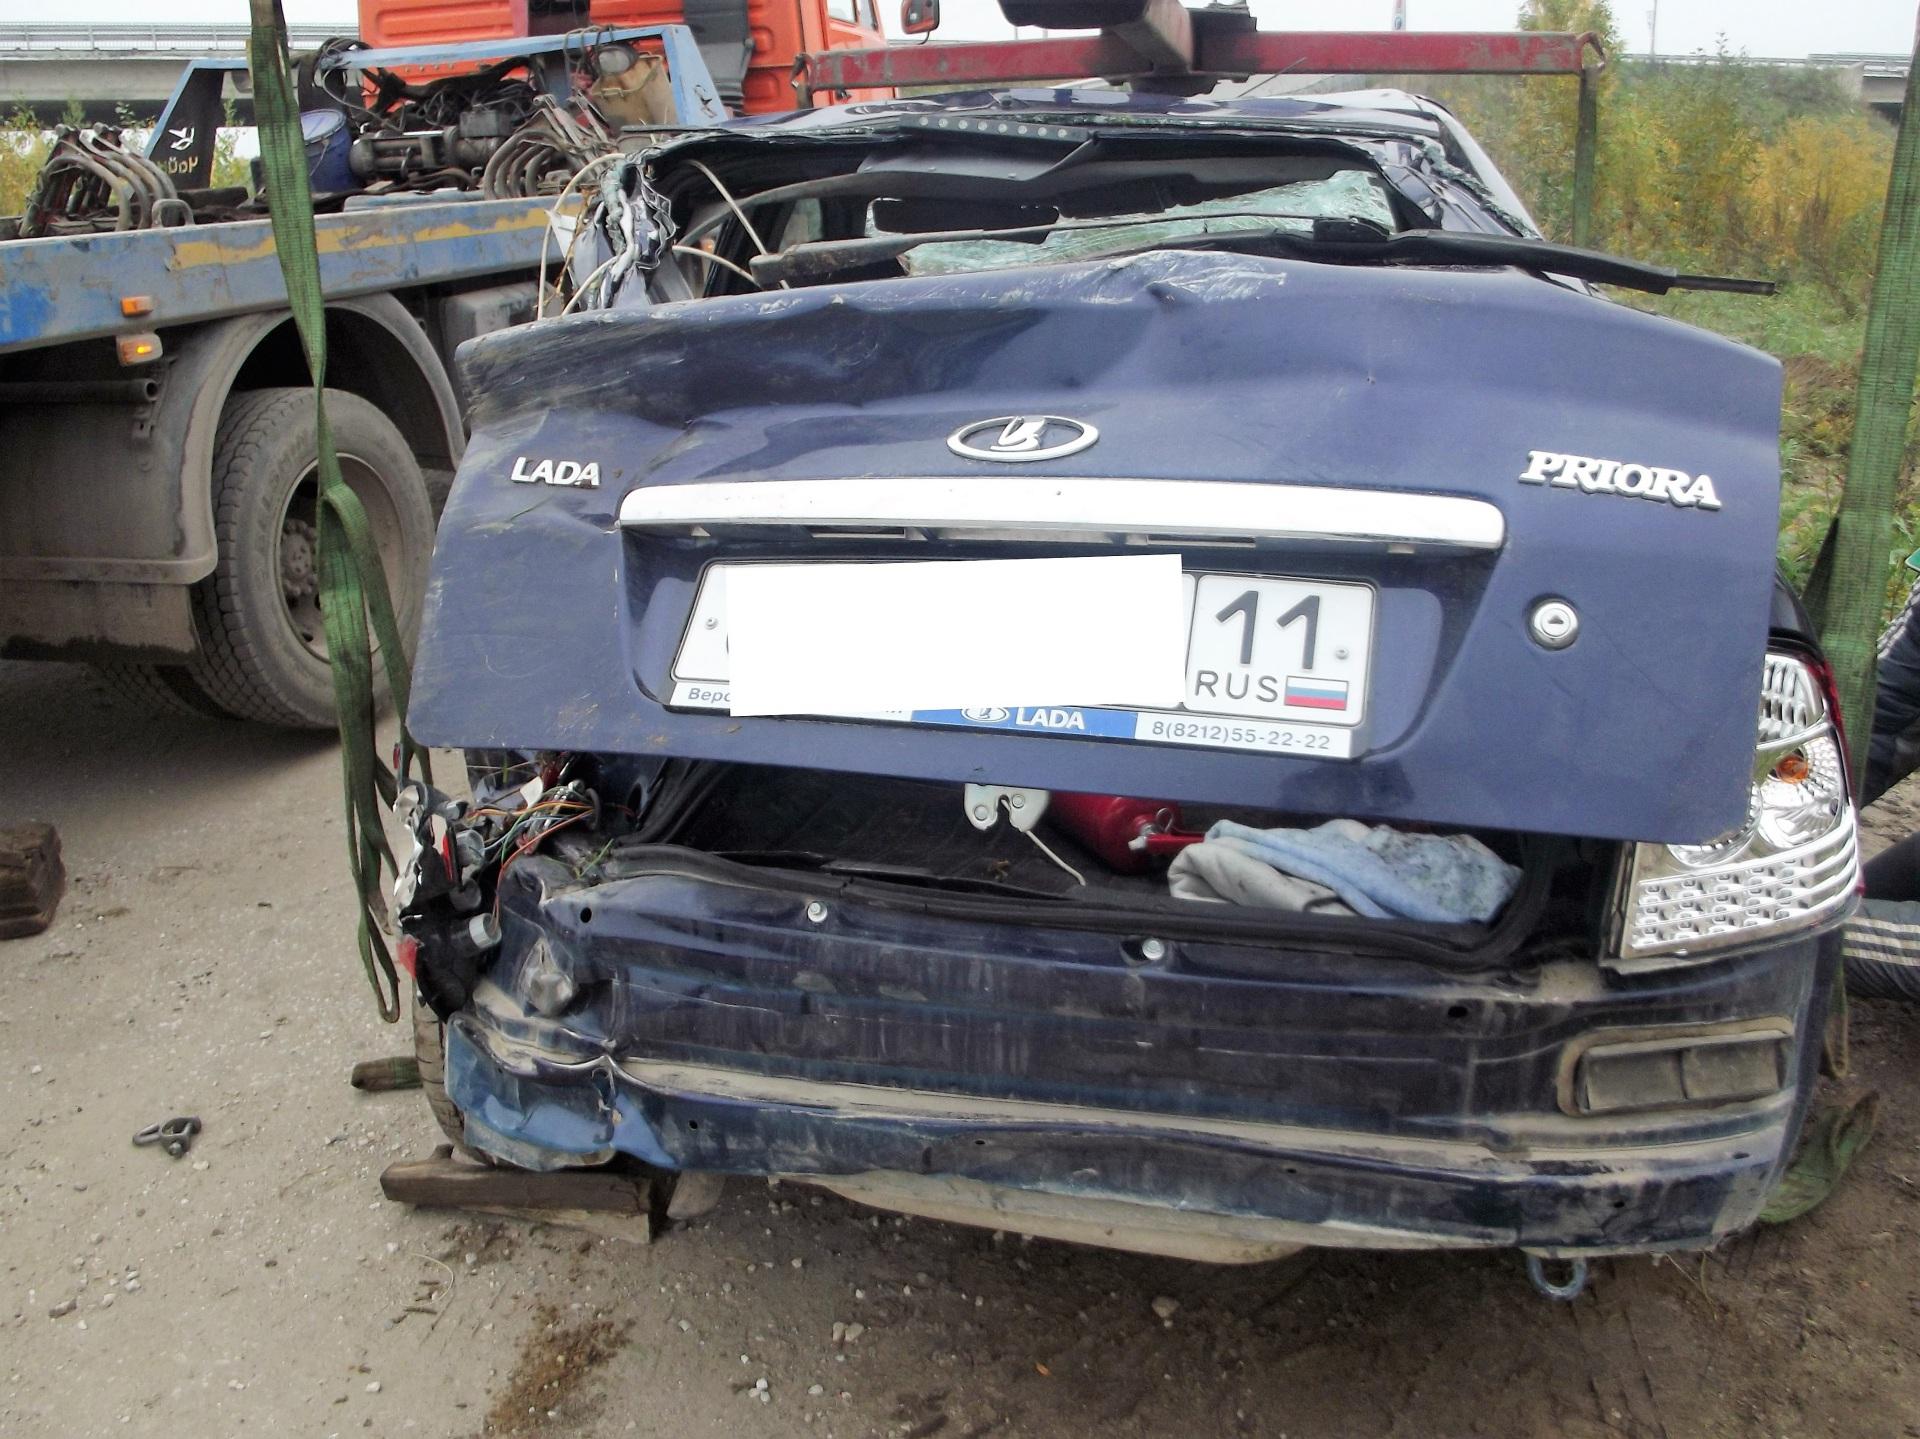 ВУхте нетрезвый шофёр на«Ладе Приоре» опрокинулся вкювет, погибла девушка